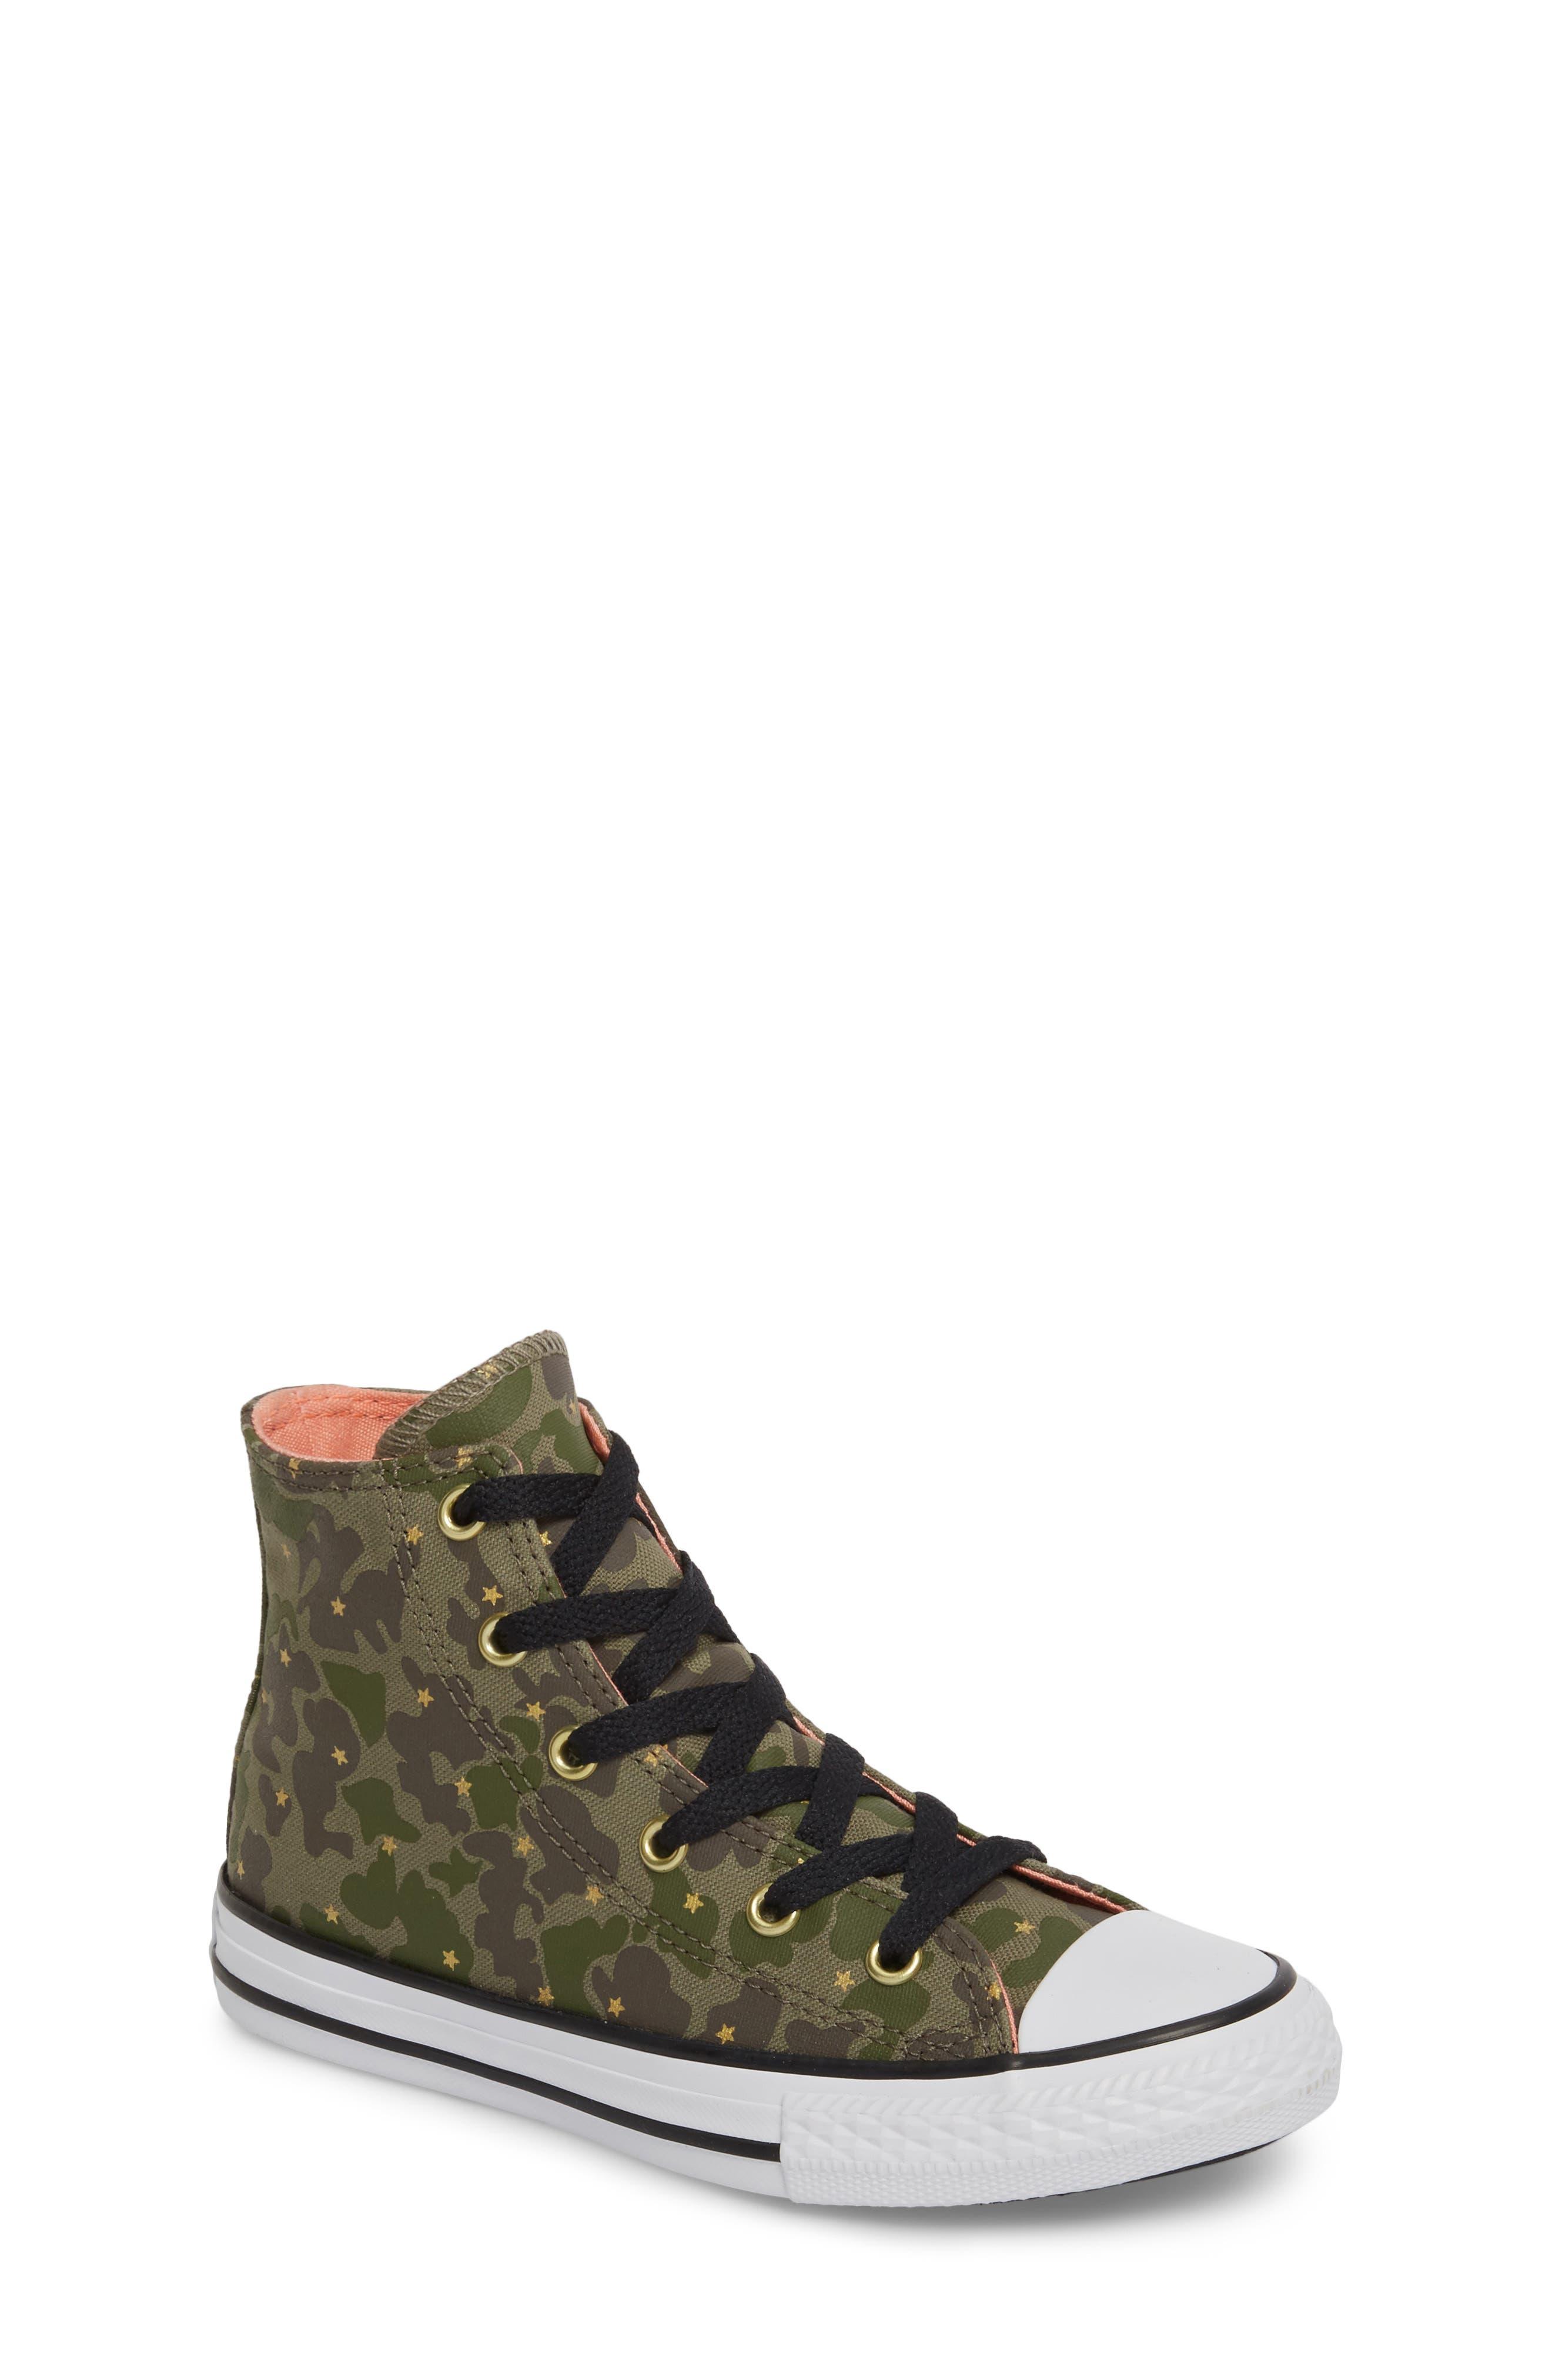 Camo High Top Sneaker,                             Main thumbnail 1, color,                             Surplus